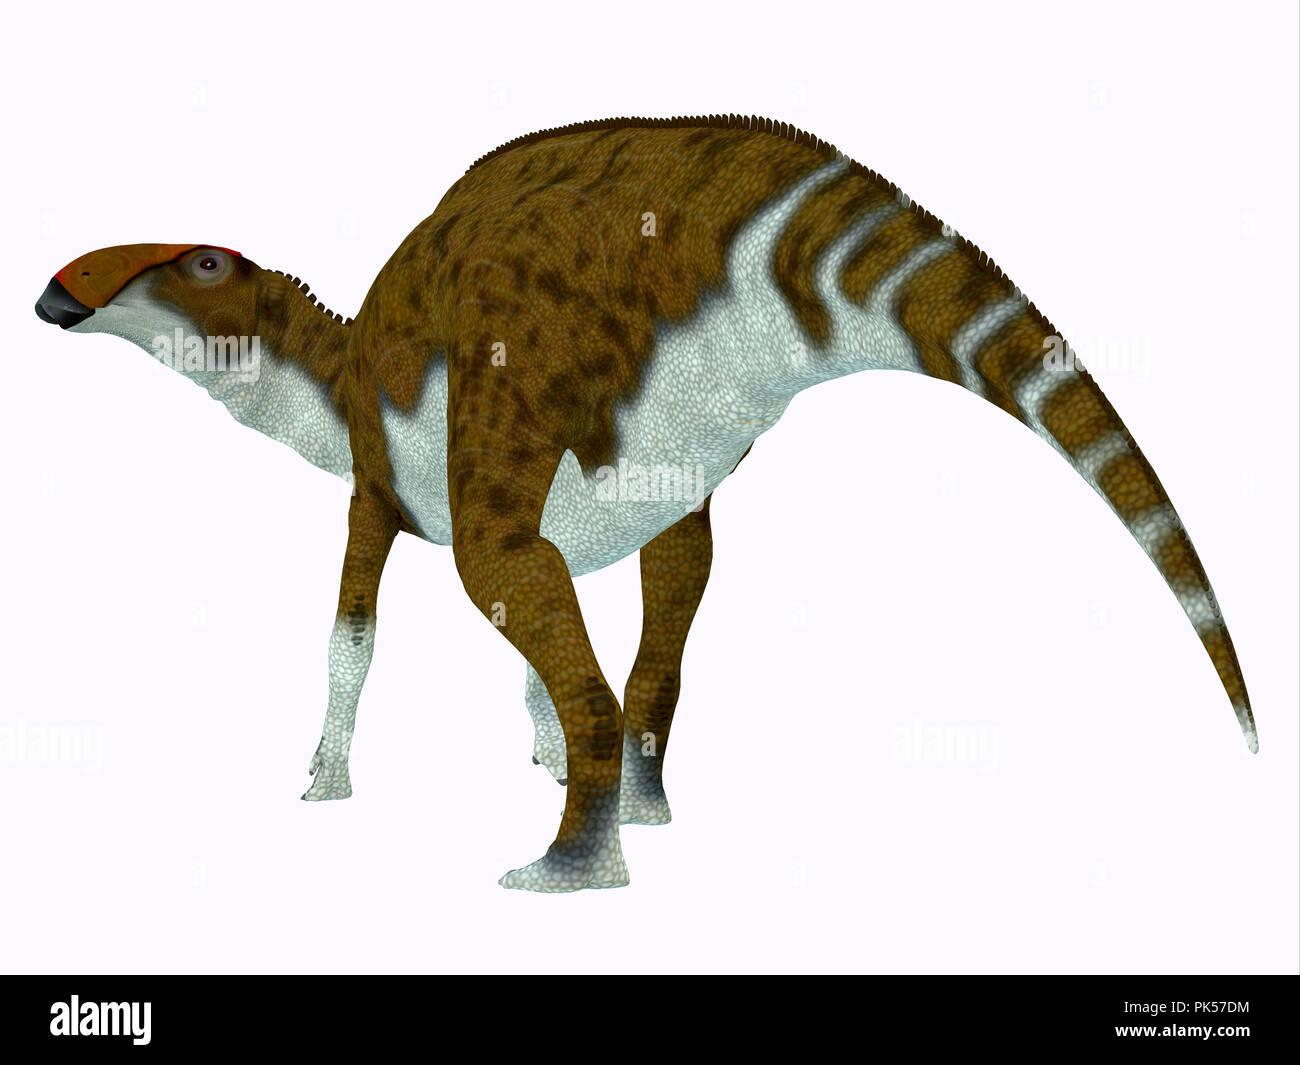 Brachylophosaurus Dinosaur Tail - Brachylophosaurus was a herbivorous Hadrosaur dinosaur that lived during the Cretaceous Period of North America. - Stock Image